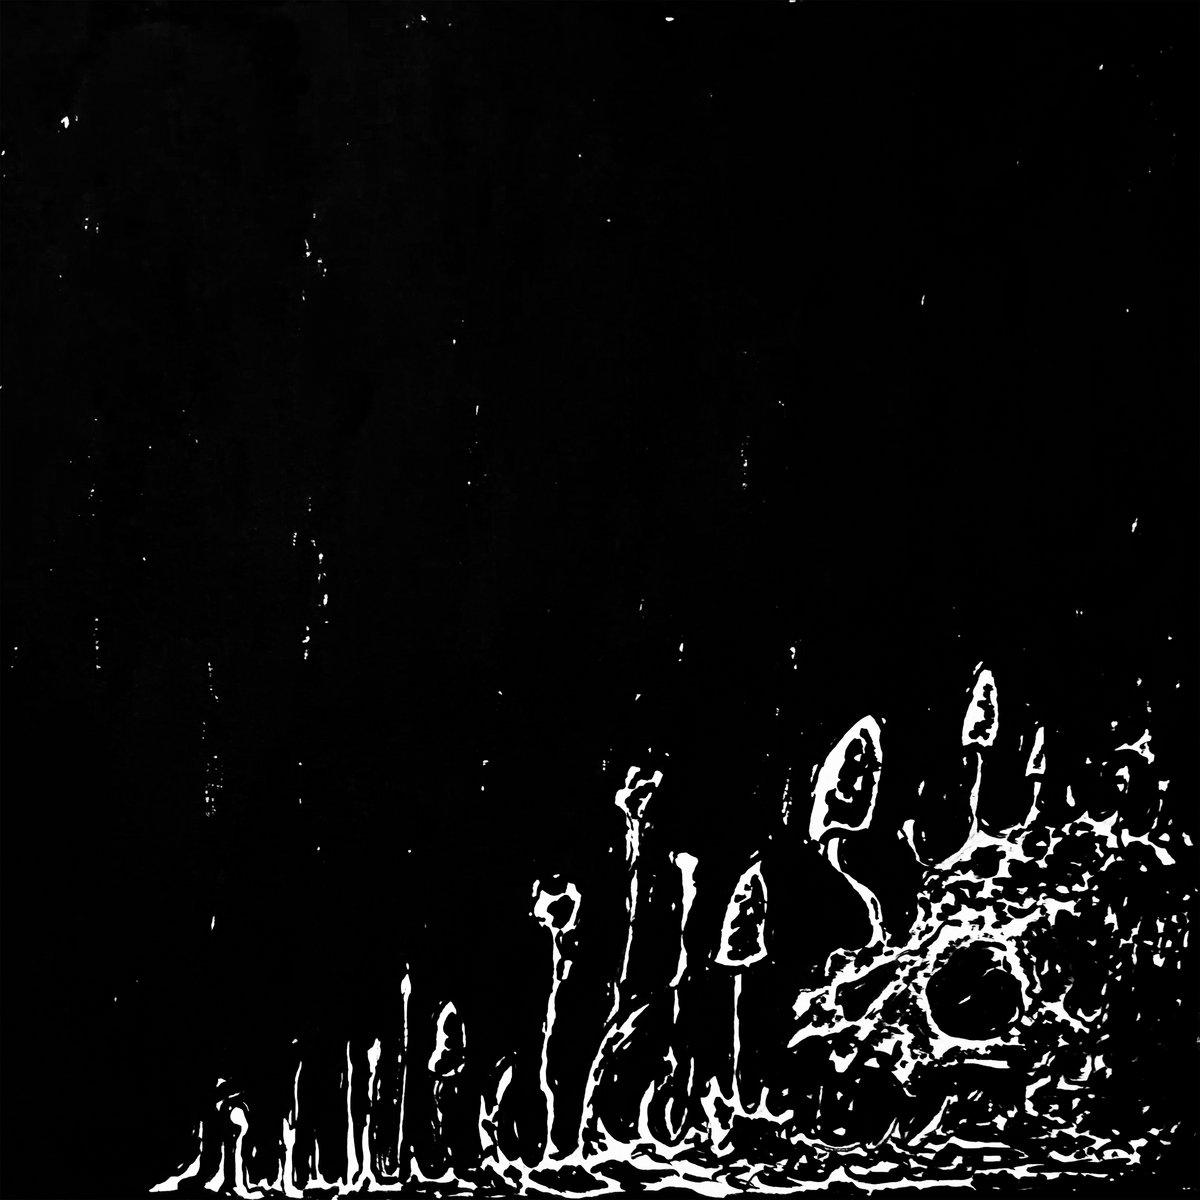 Reseña: CAVERN DEEP.-'Cavern deep'